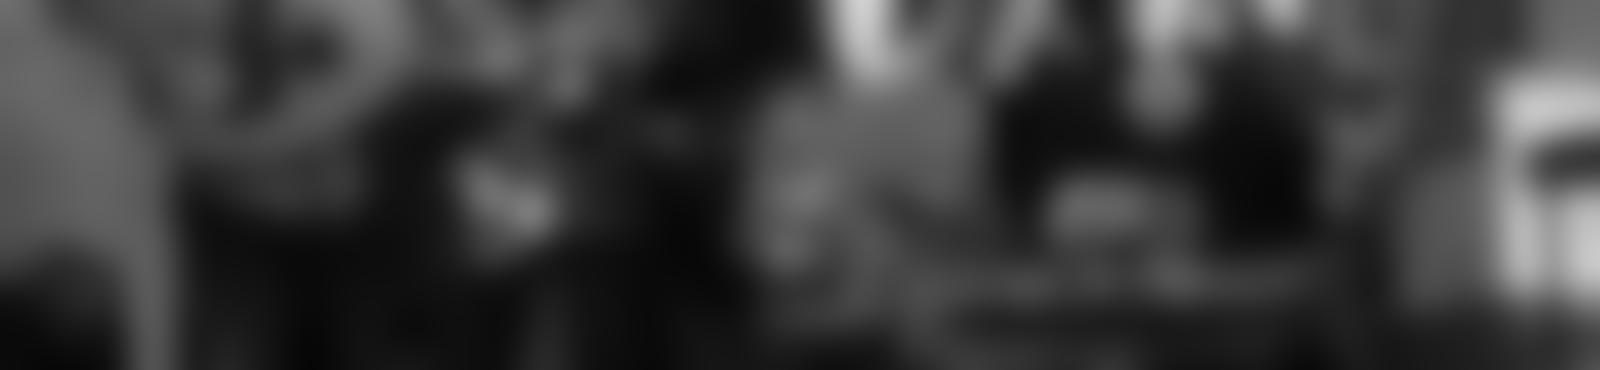 Blurred b4a8284f 9597 4f9c af93 bdad69455e8b